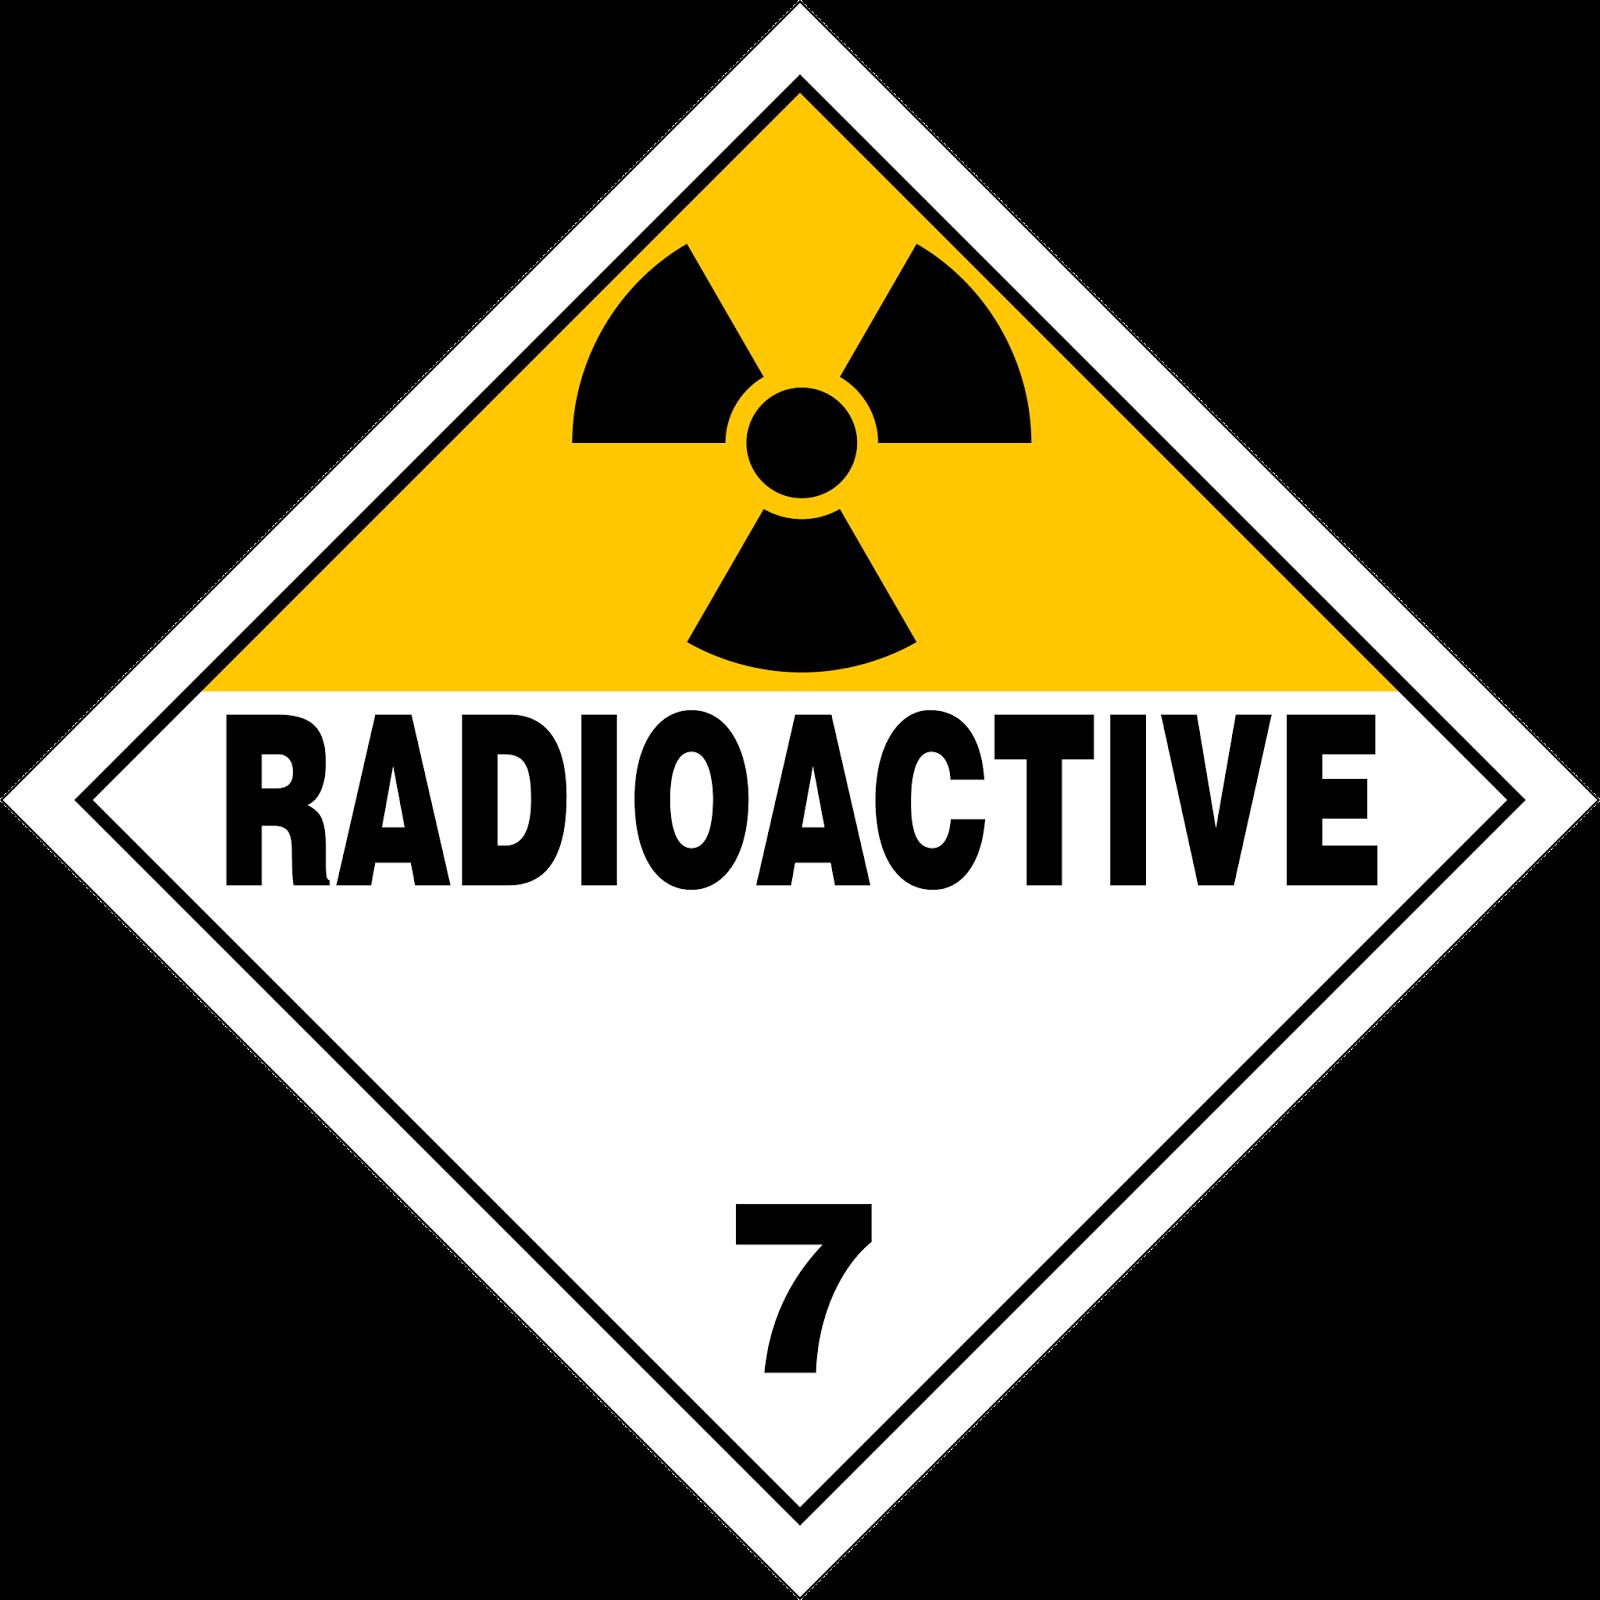 ADR Radiactivos Autoescuela Vandalia Peligros